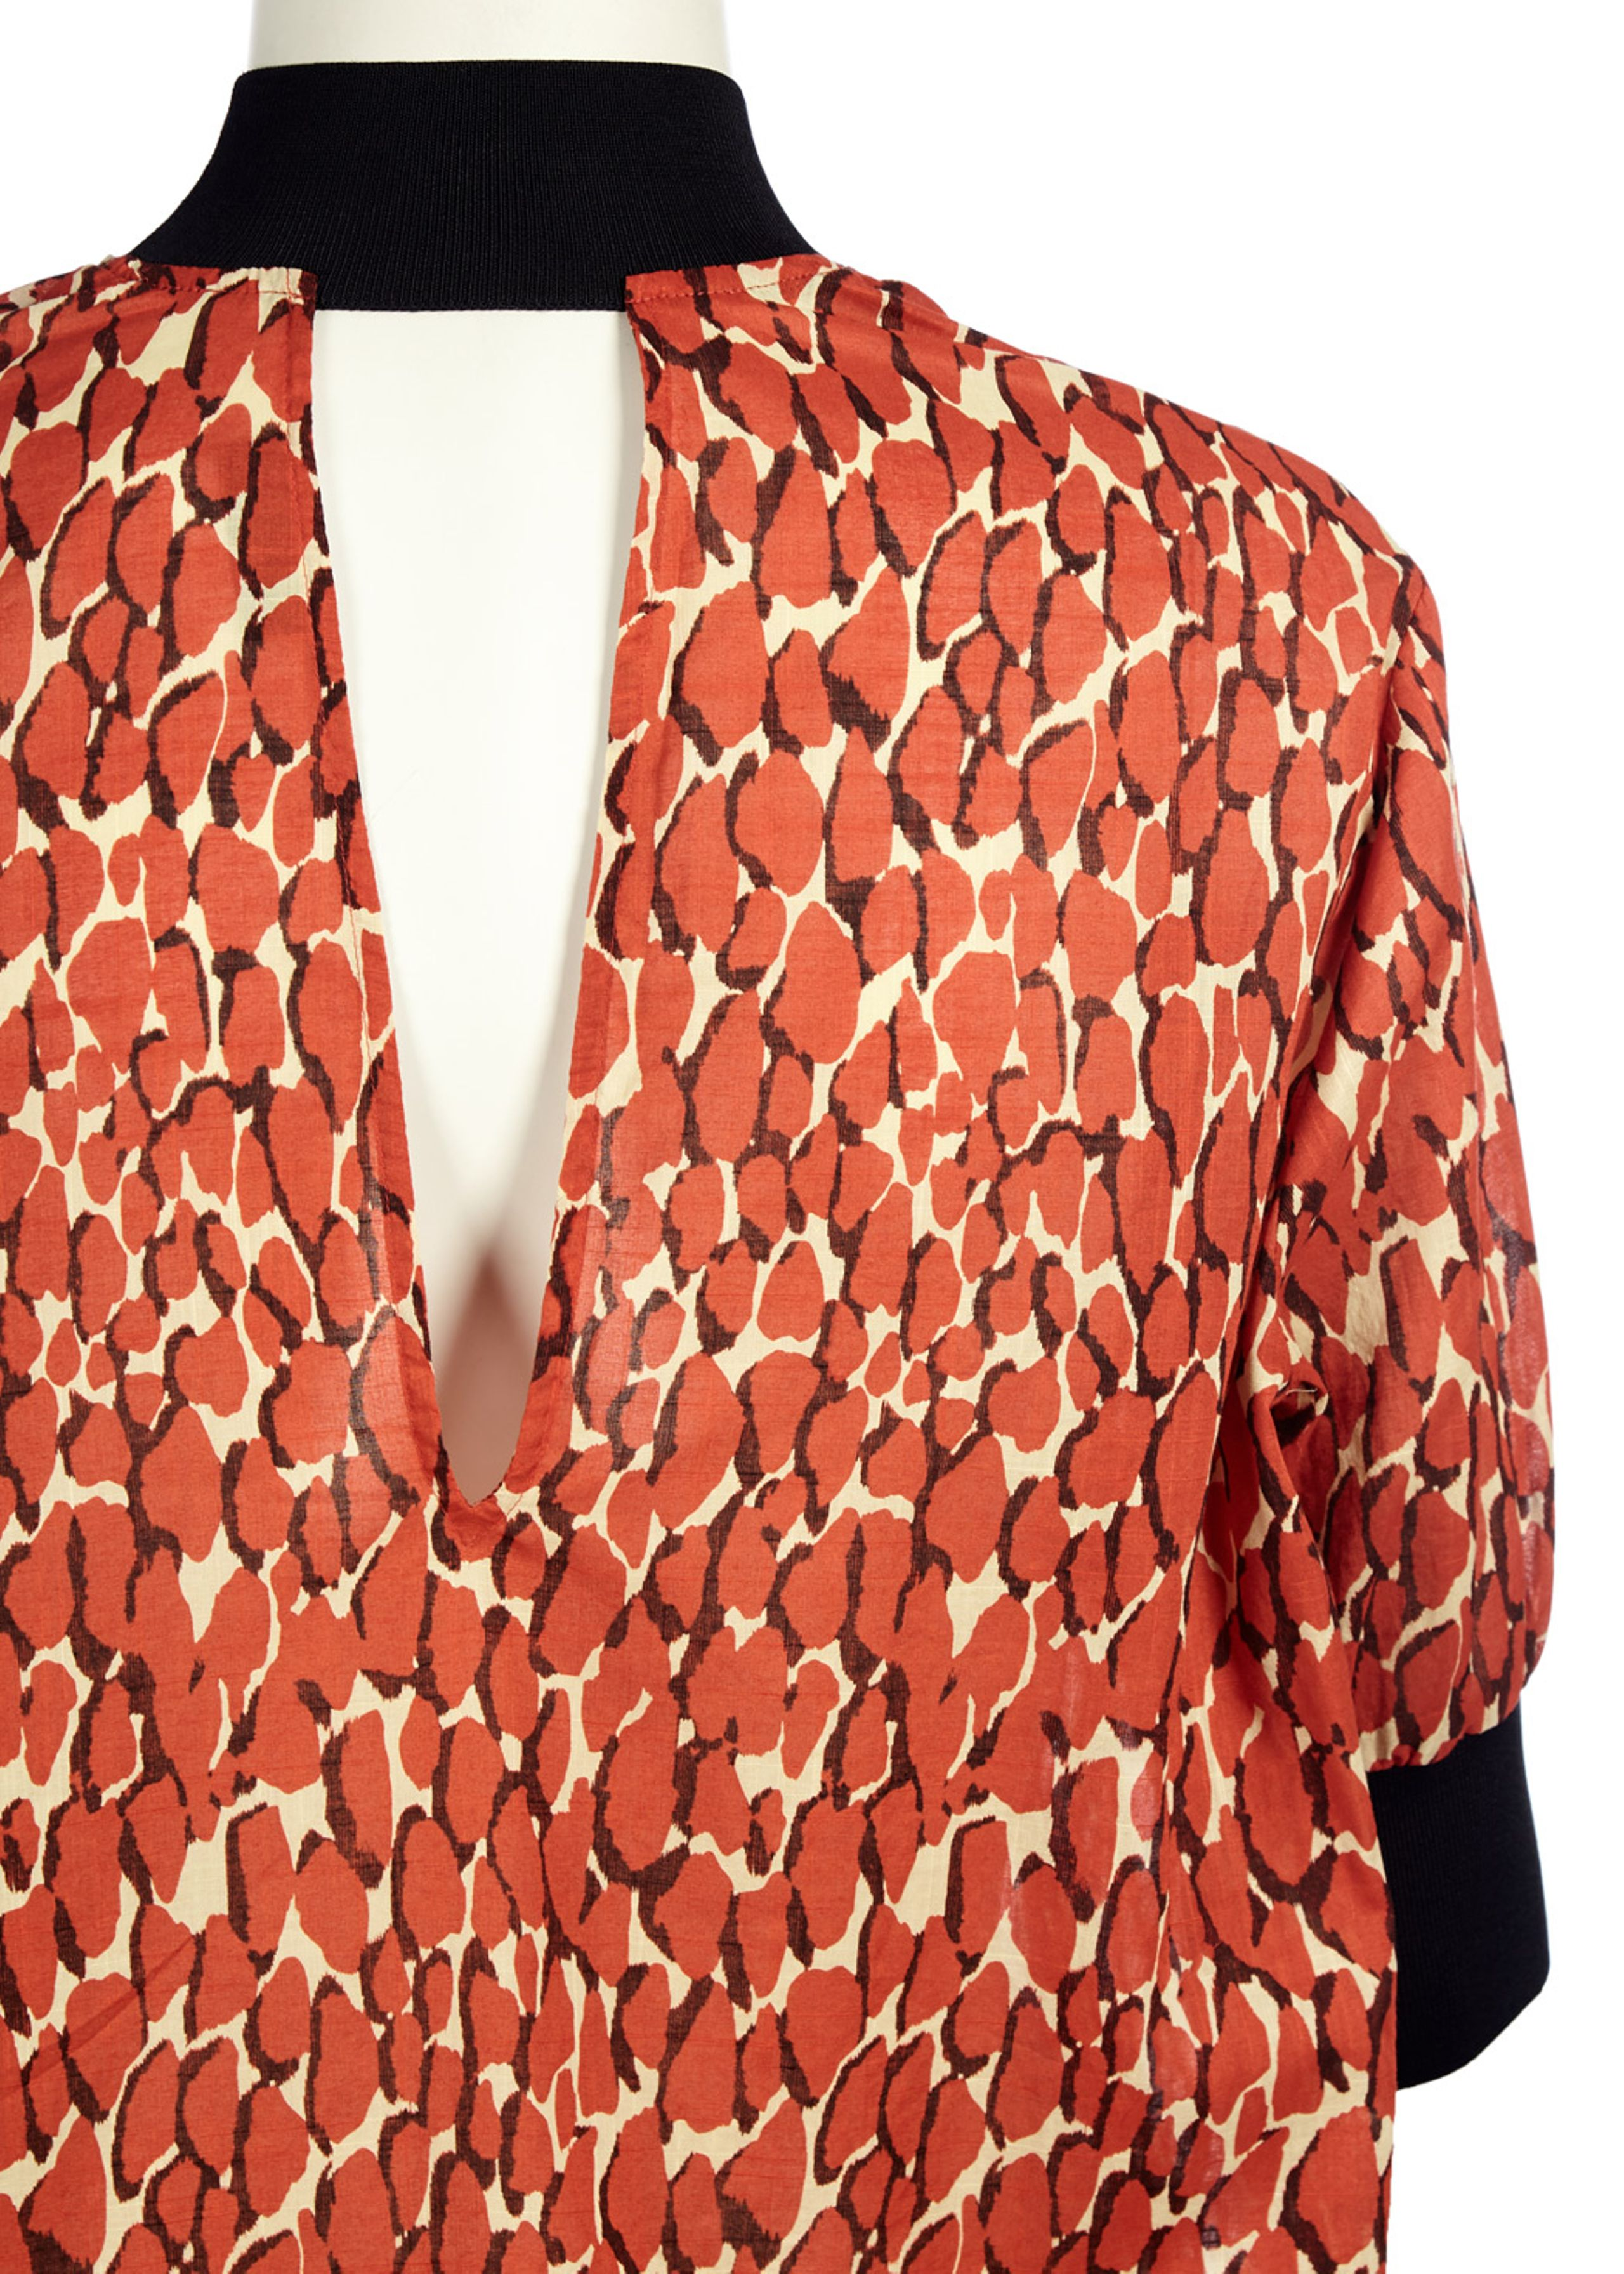 c746b410dc1 ... By Malene Birger - T-shirt - Cobolias - Autumn Red ...